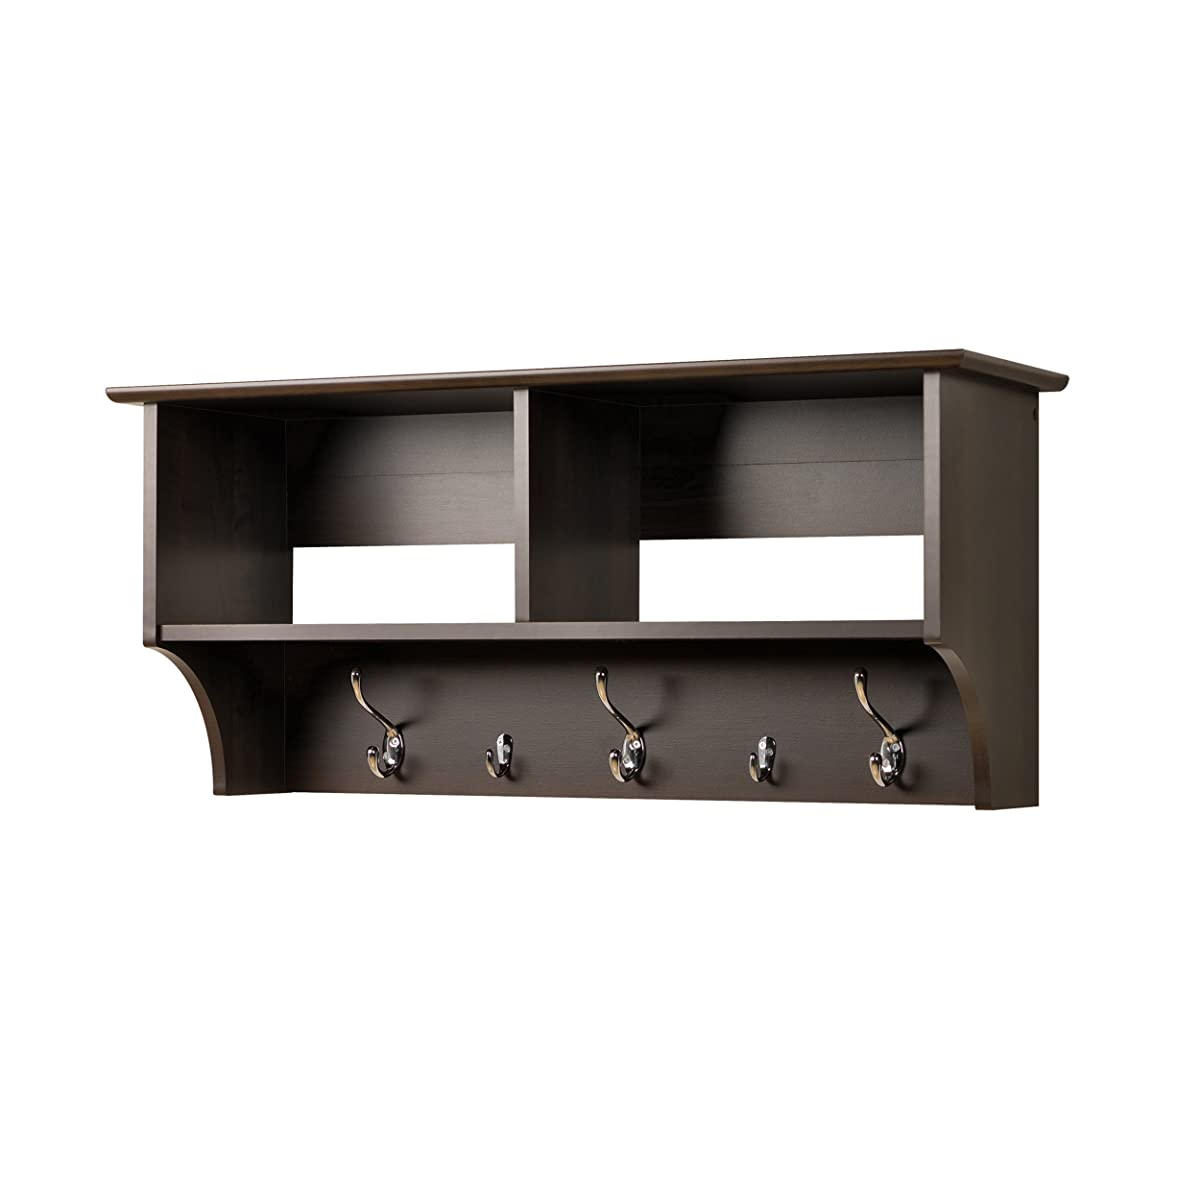 "Prepac 36"" Hanging Entryway Shelf, Espresso"